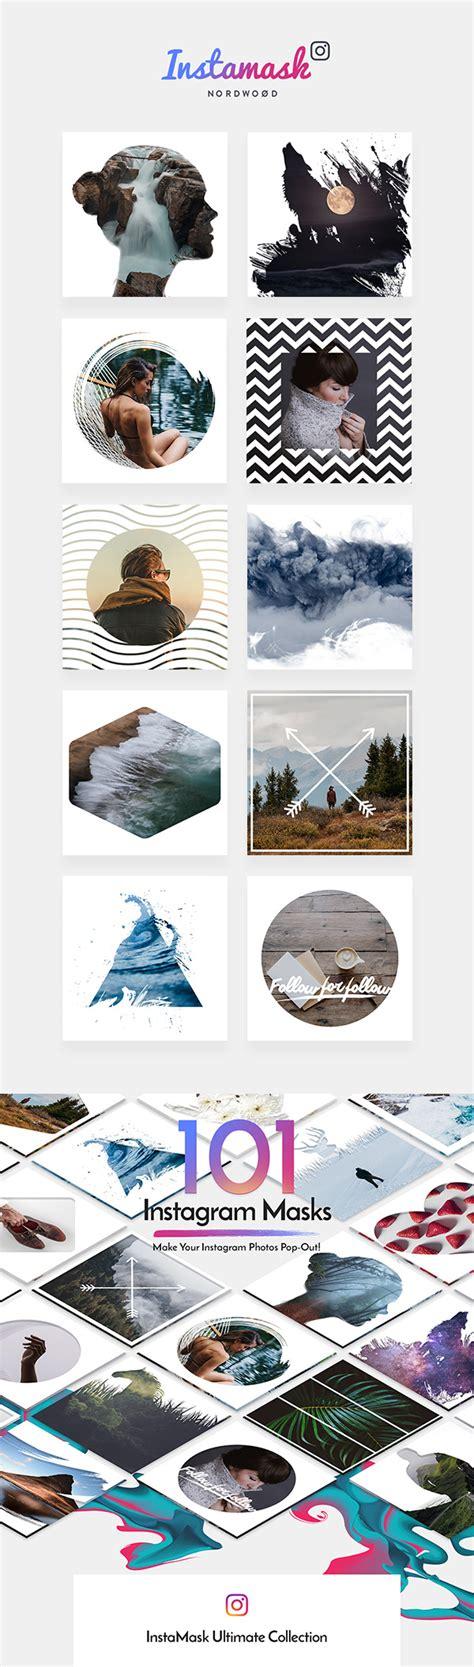 instagram design team 05 free instagram design template creatily market